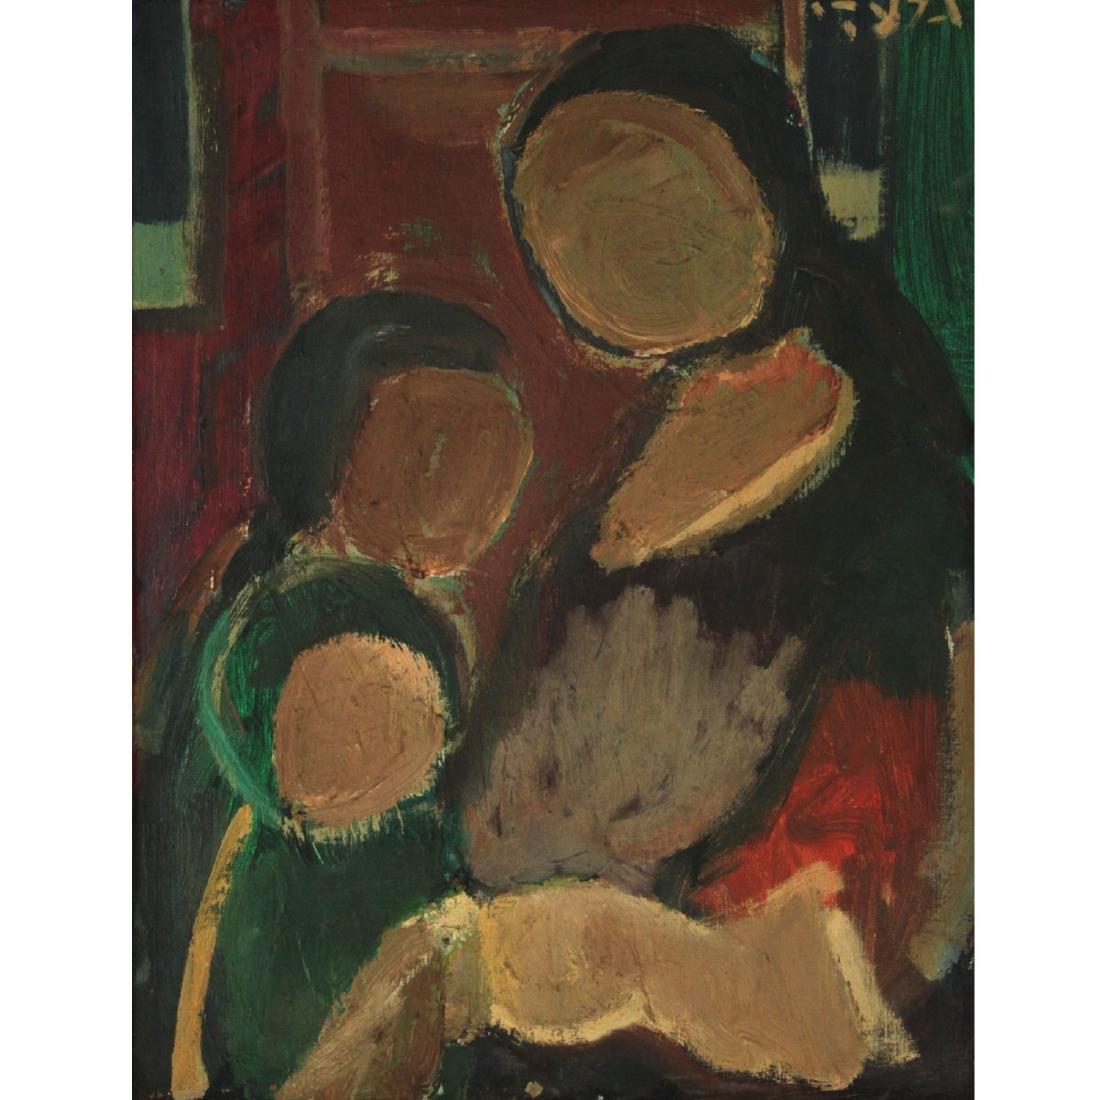 Aharon Giladi (1907-1993) - Figures, Oil on Canvas.